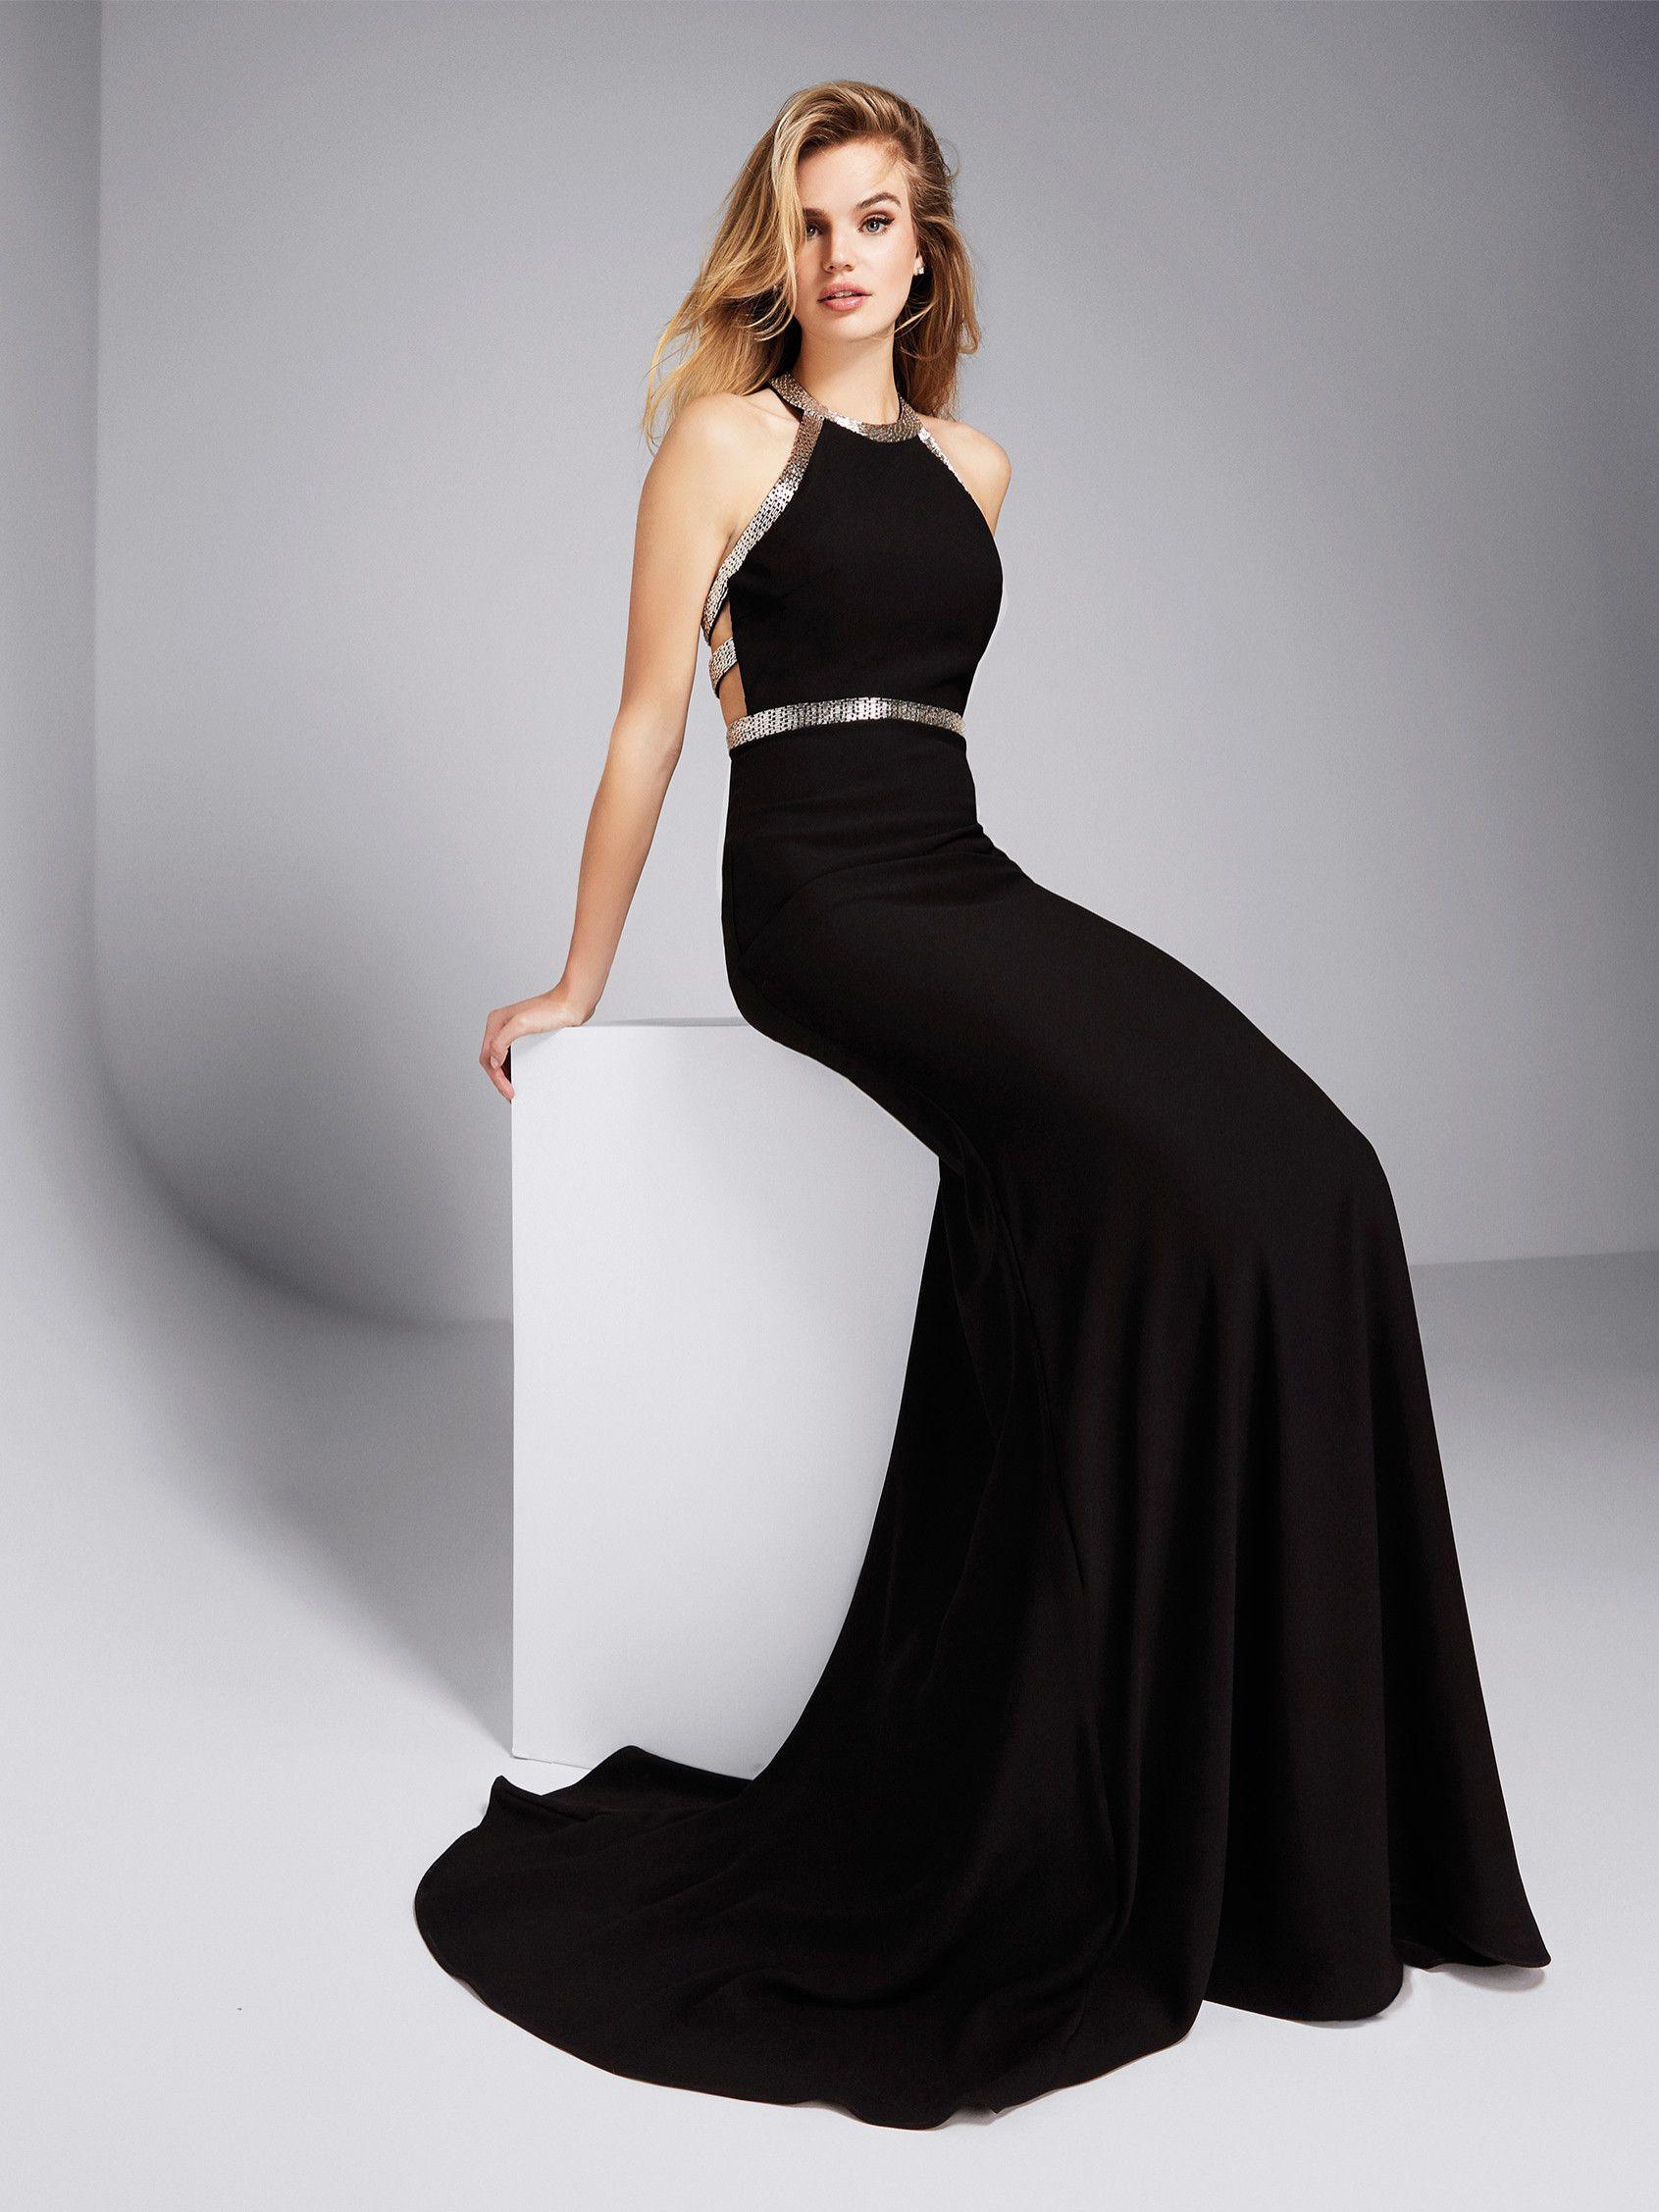 Comprar vestido largo de boda